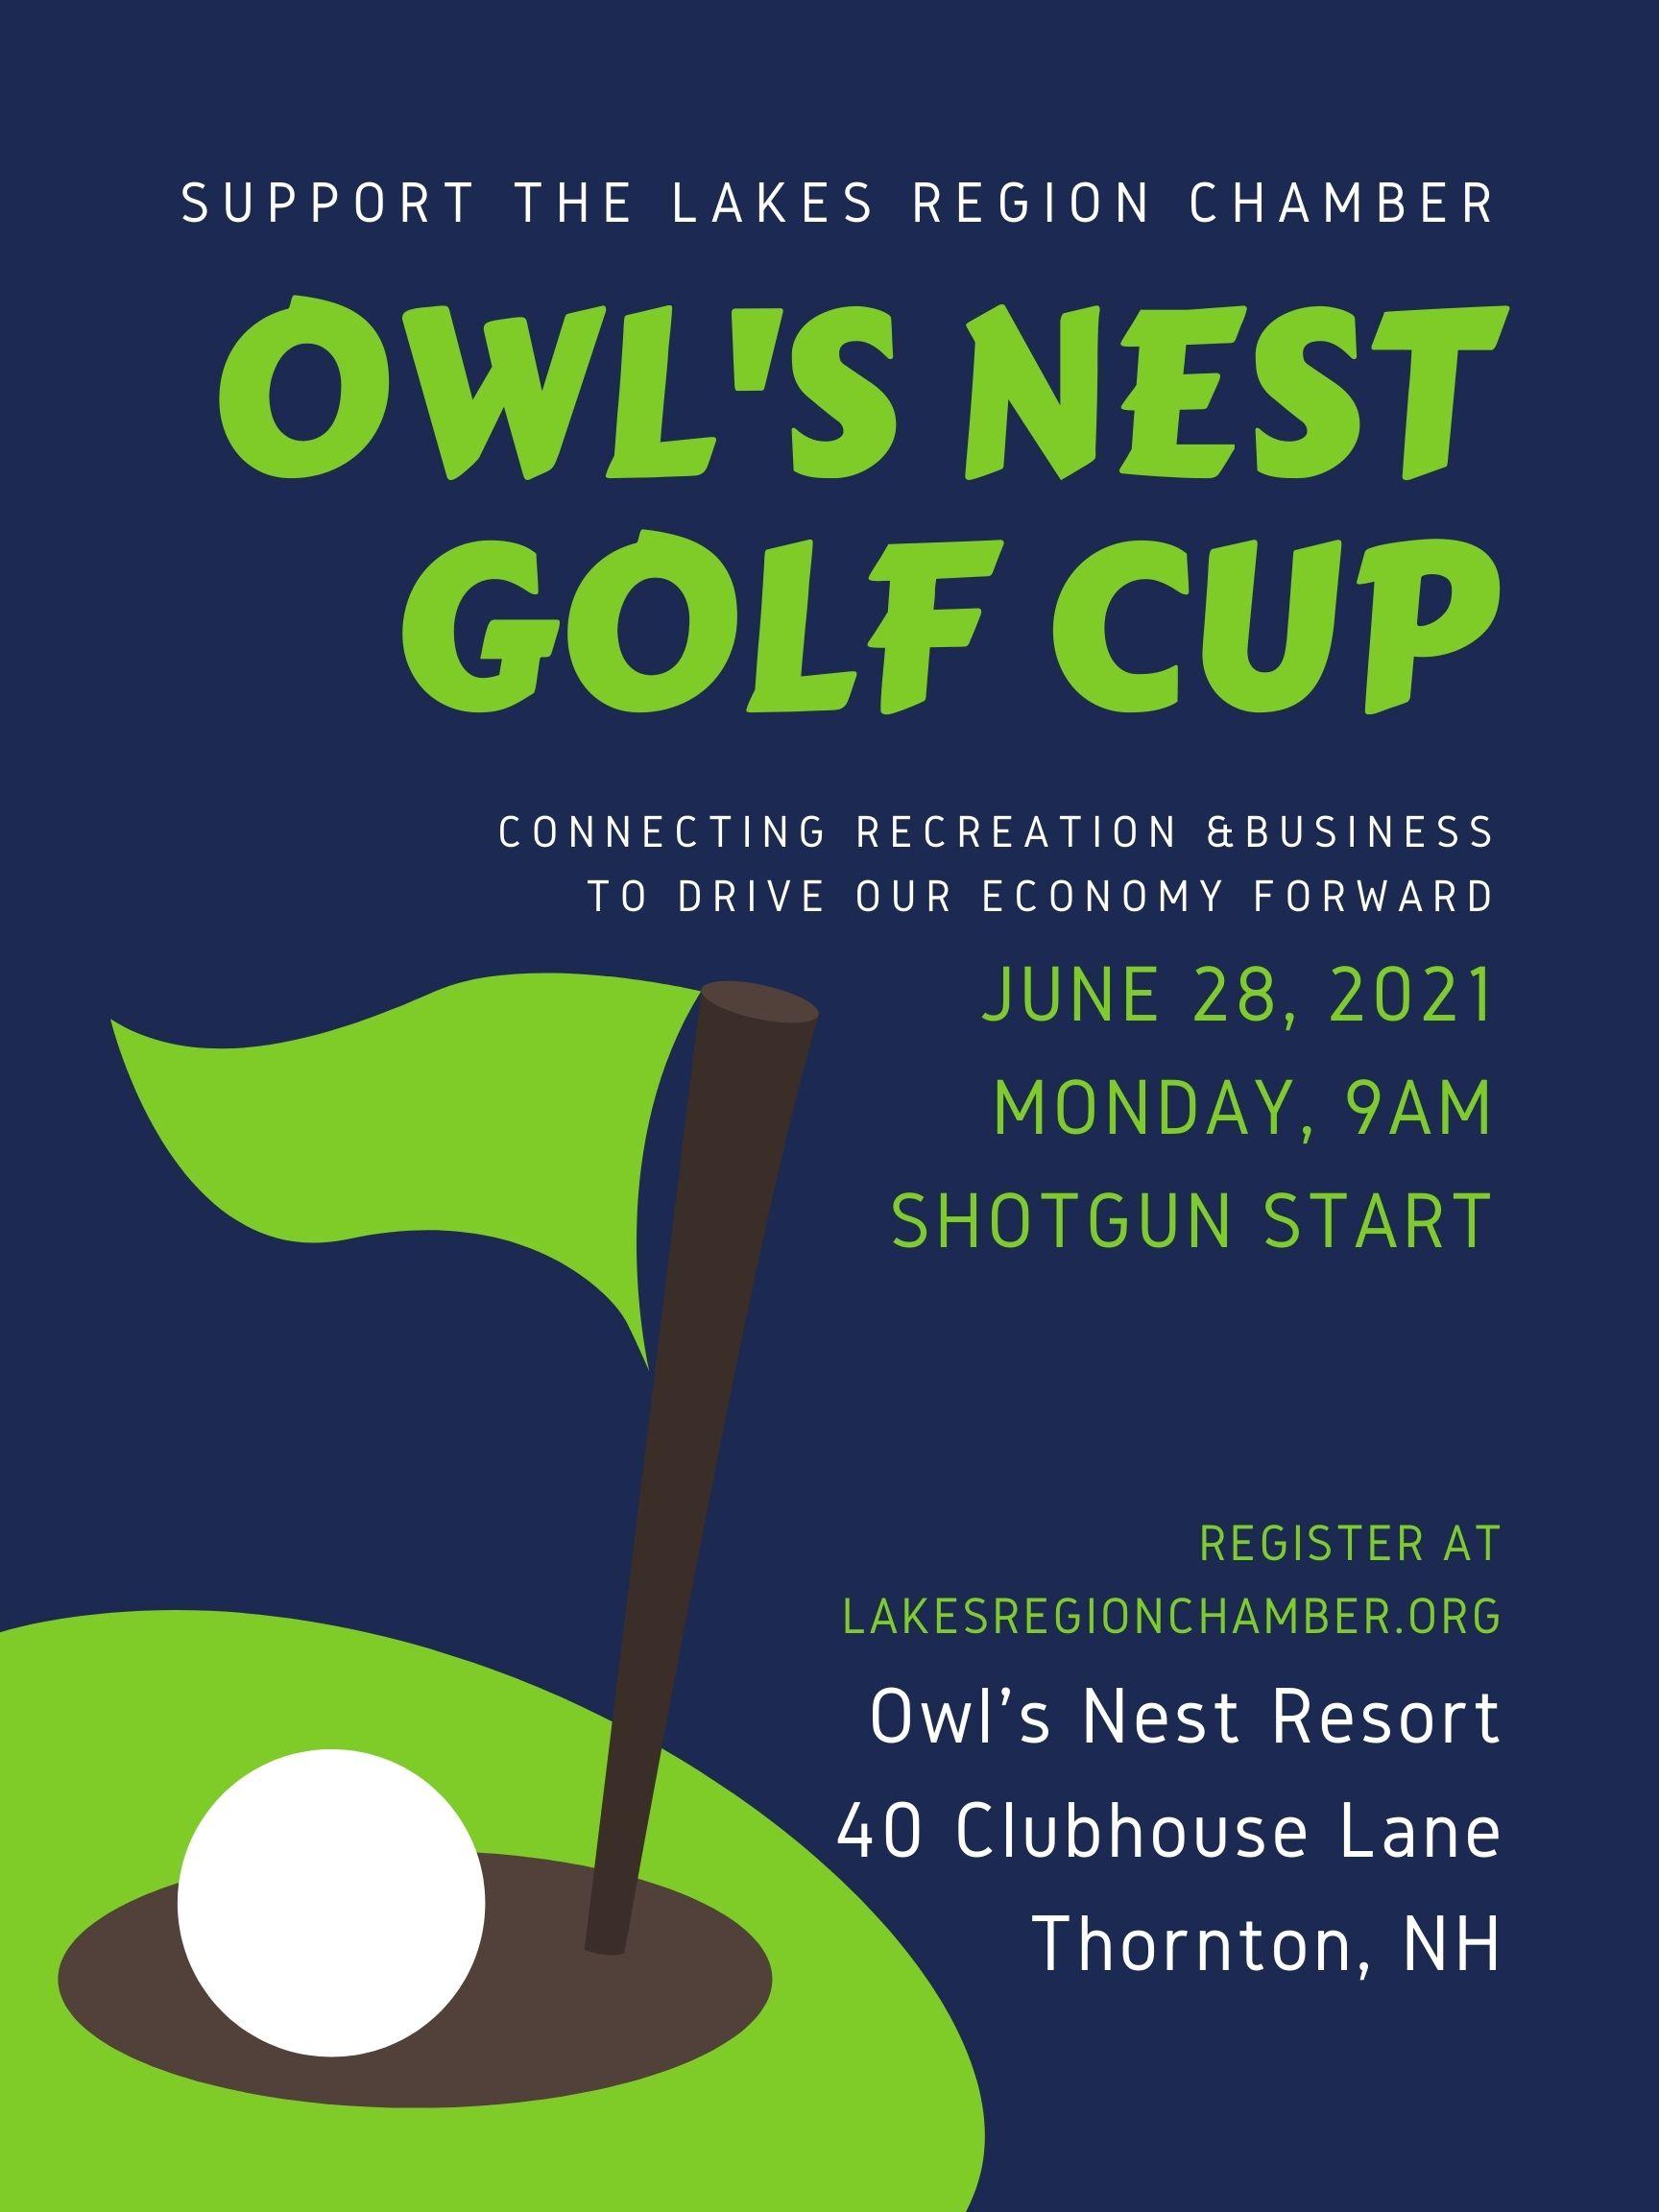 OwlsNestGolfCup2021-(2).png